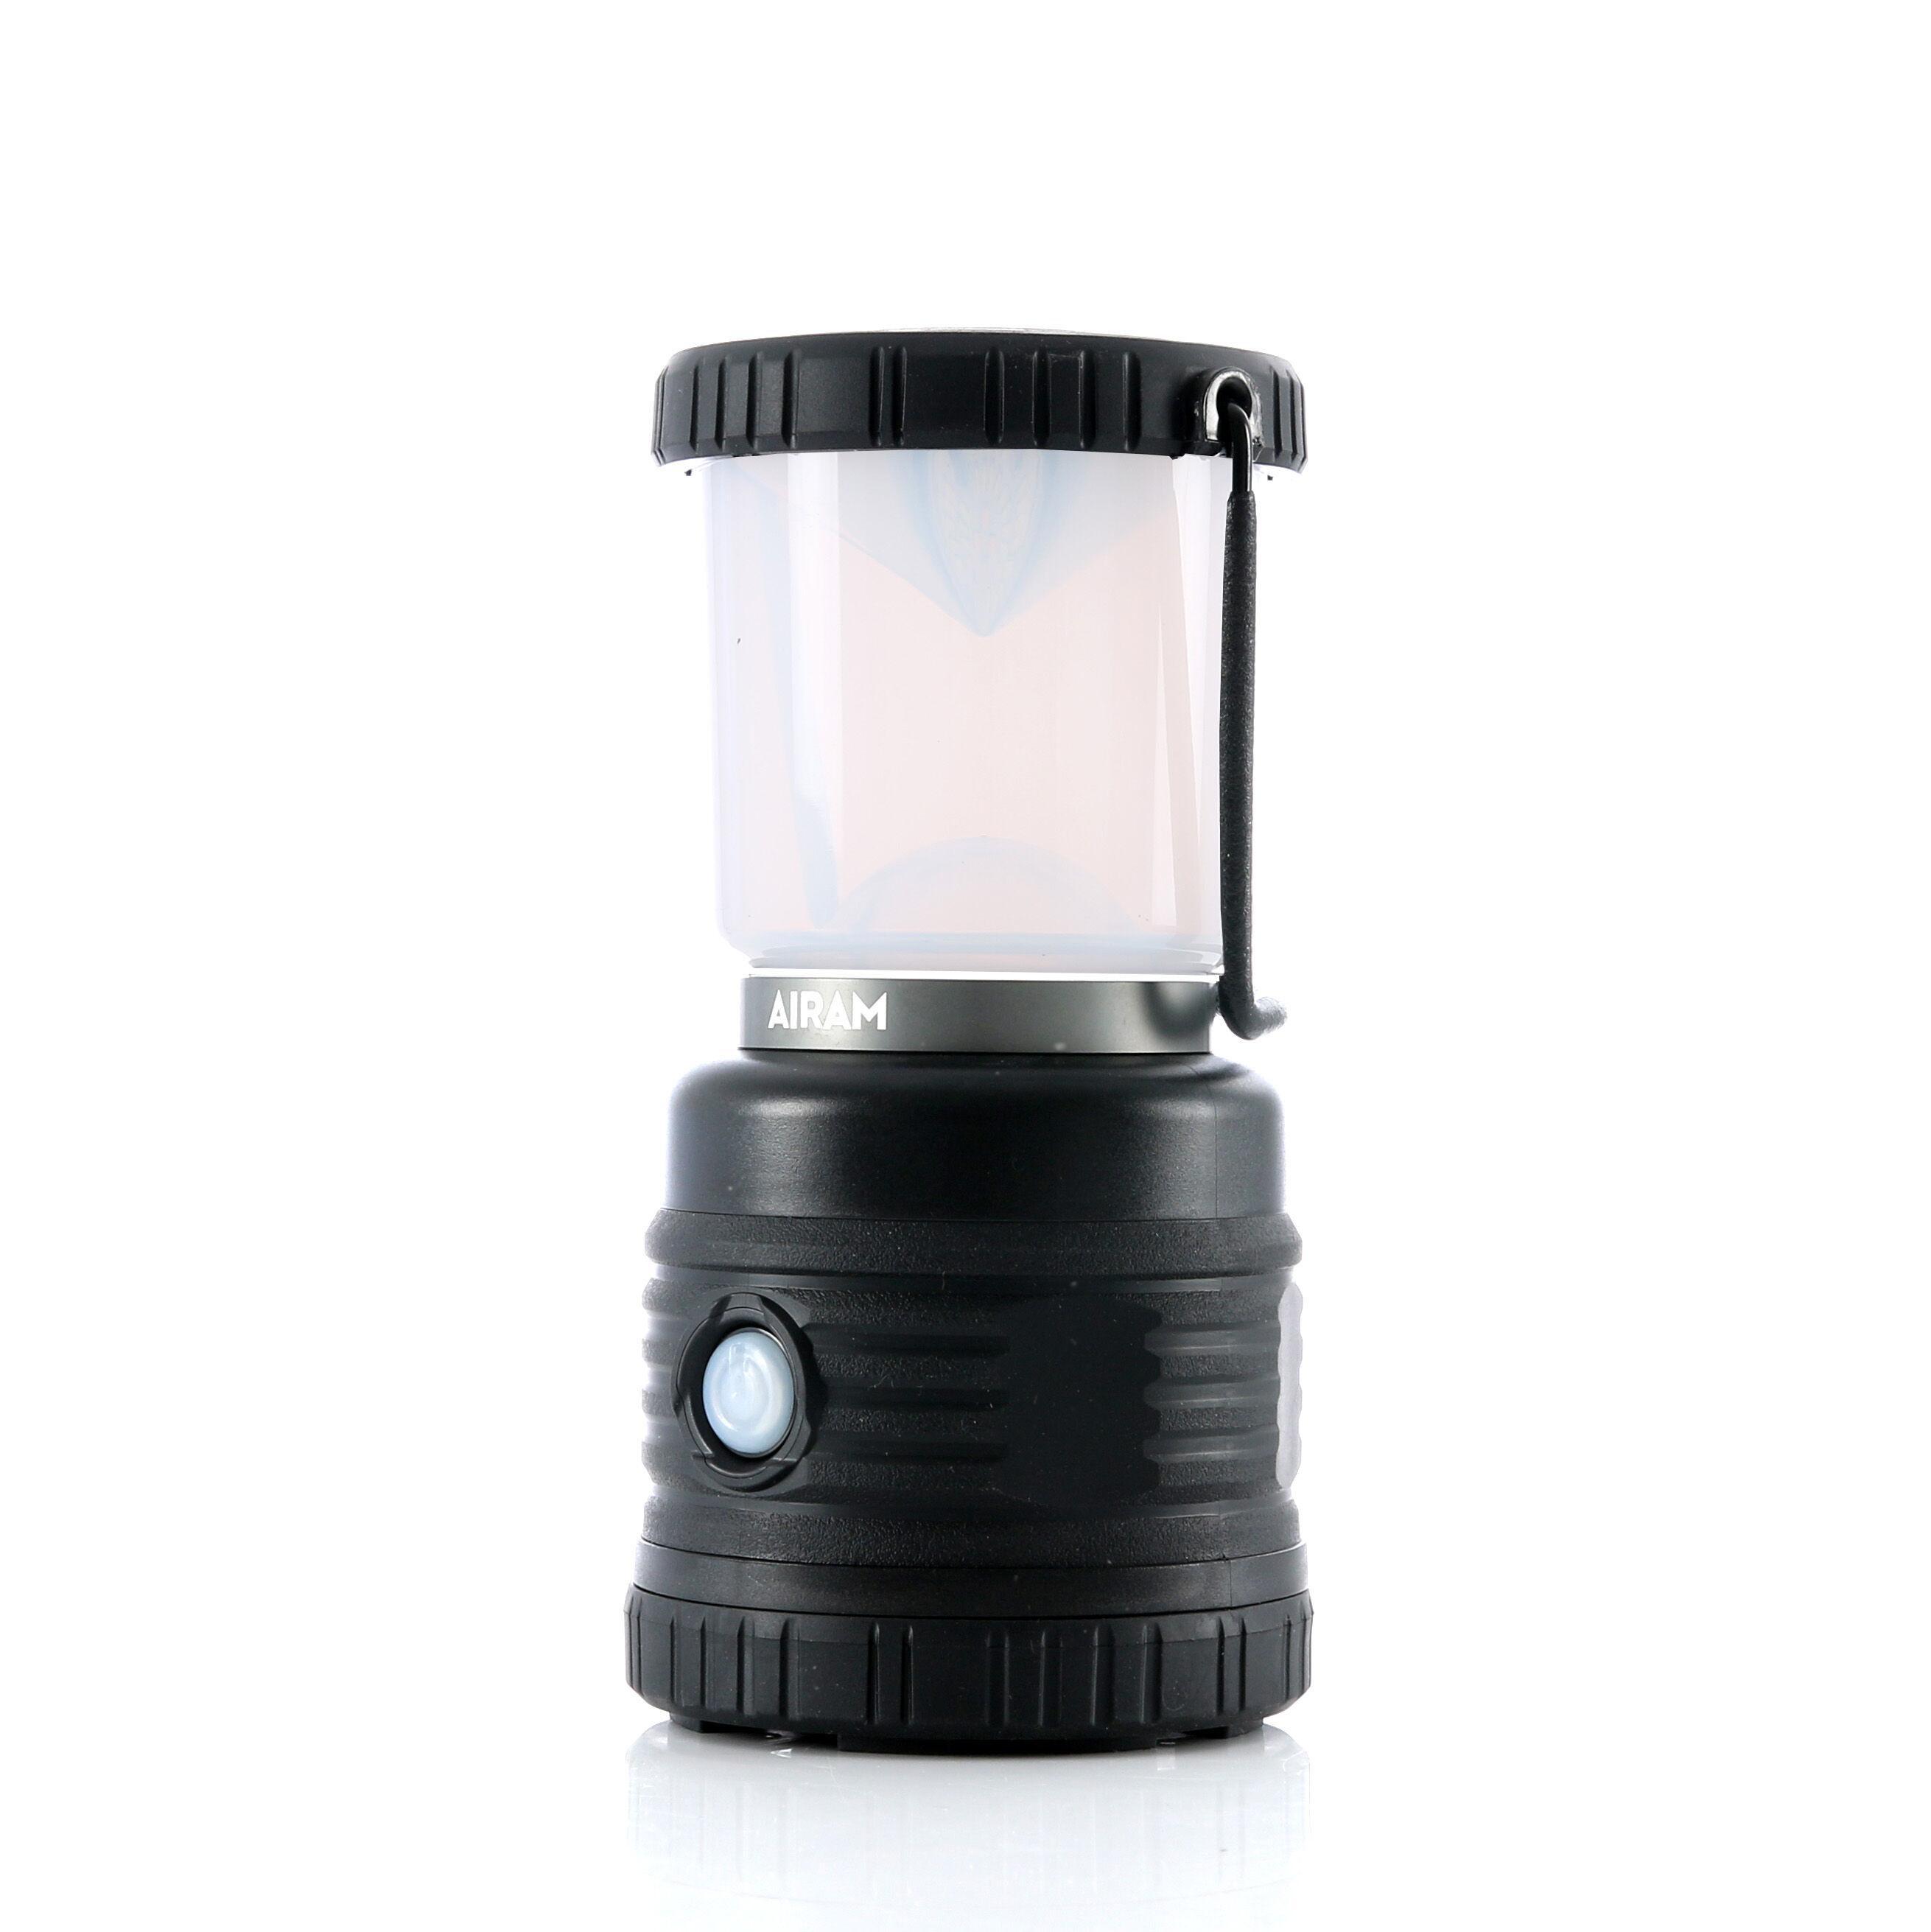 AIRAM LED-lyhty, Airam Camper USB, 1000 lm